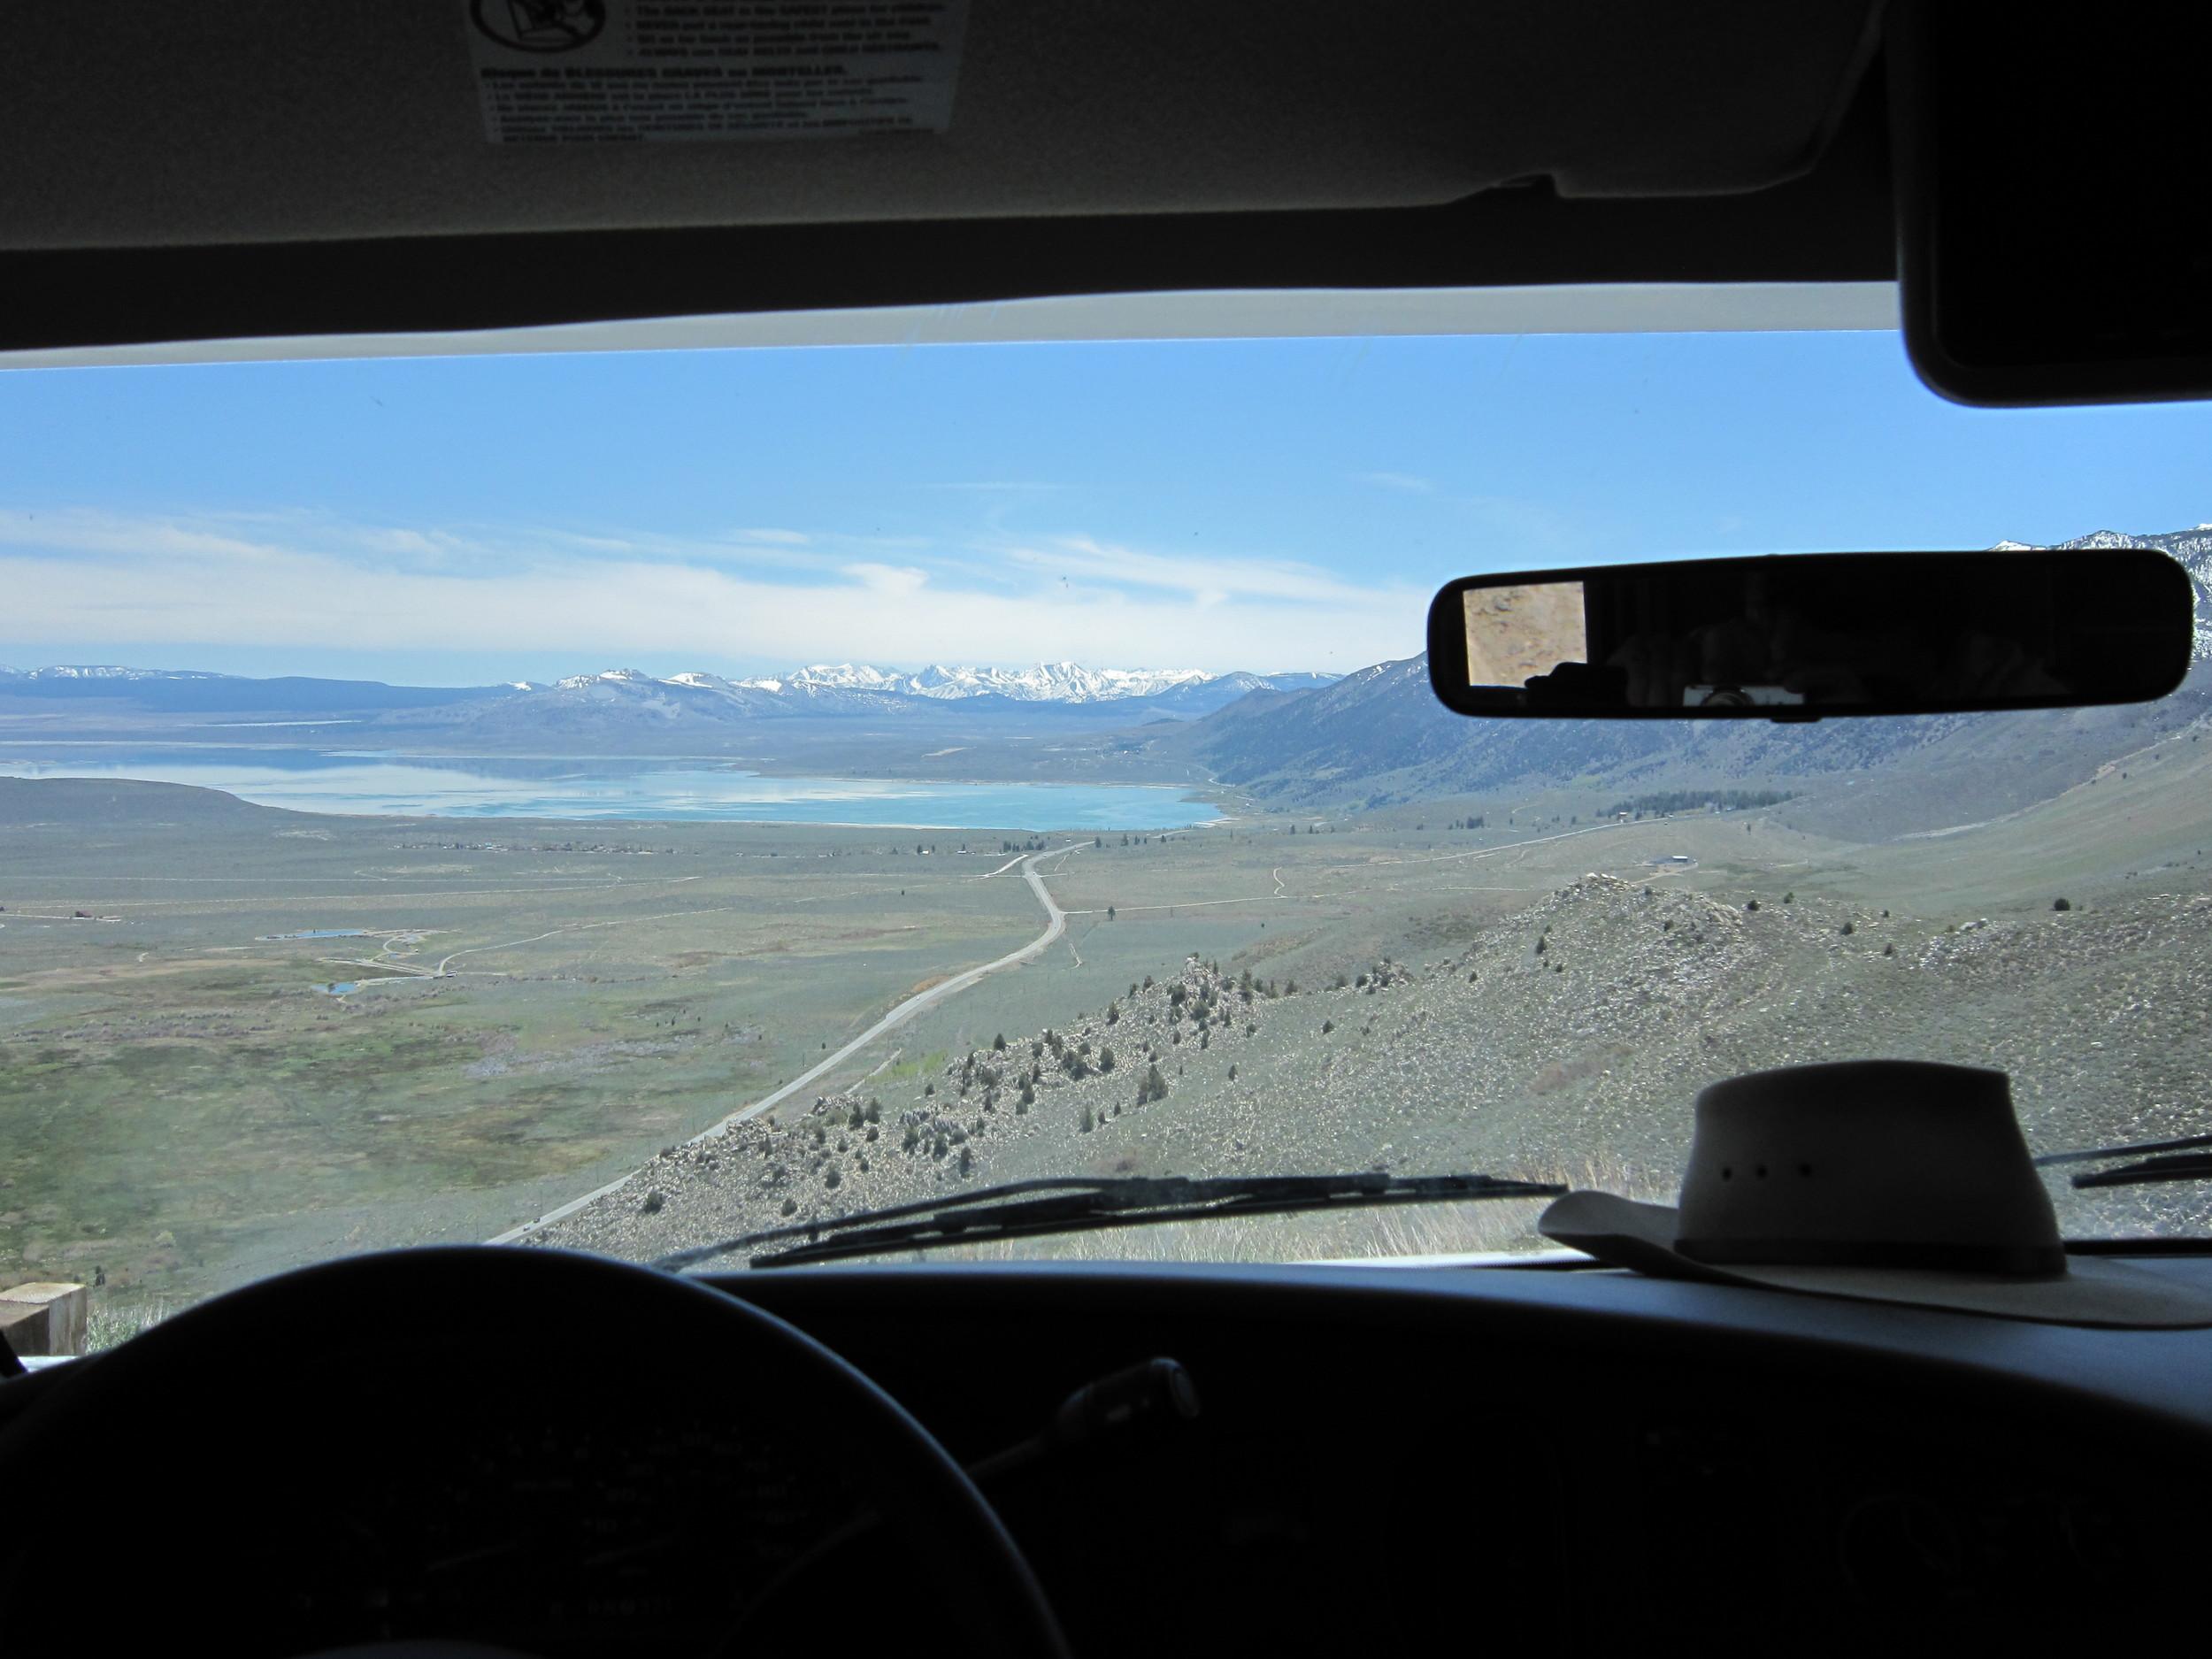 T. Robinson, Mono Lake, 2008